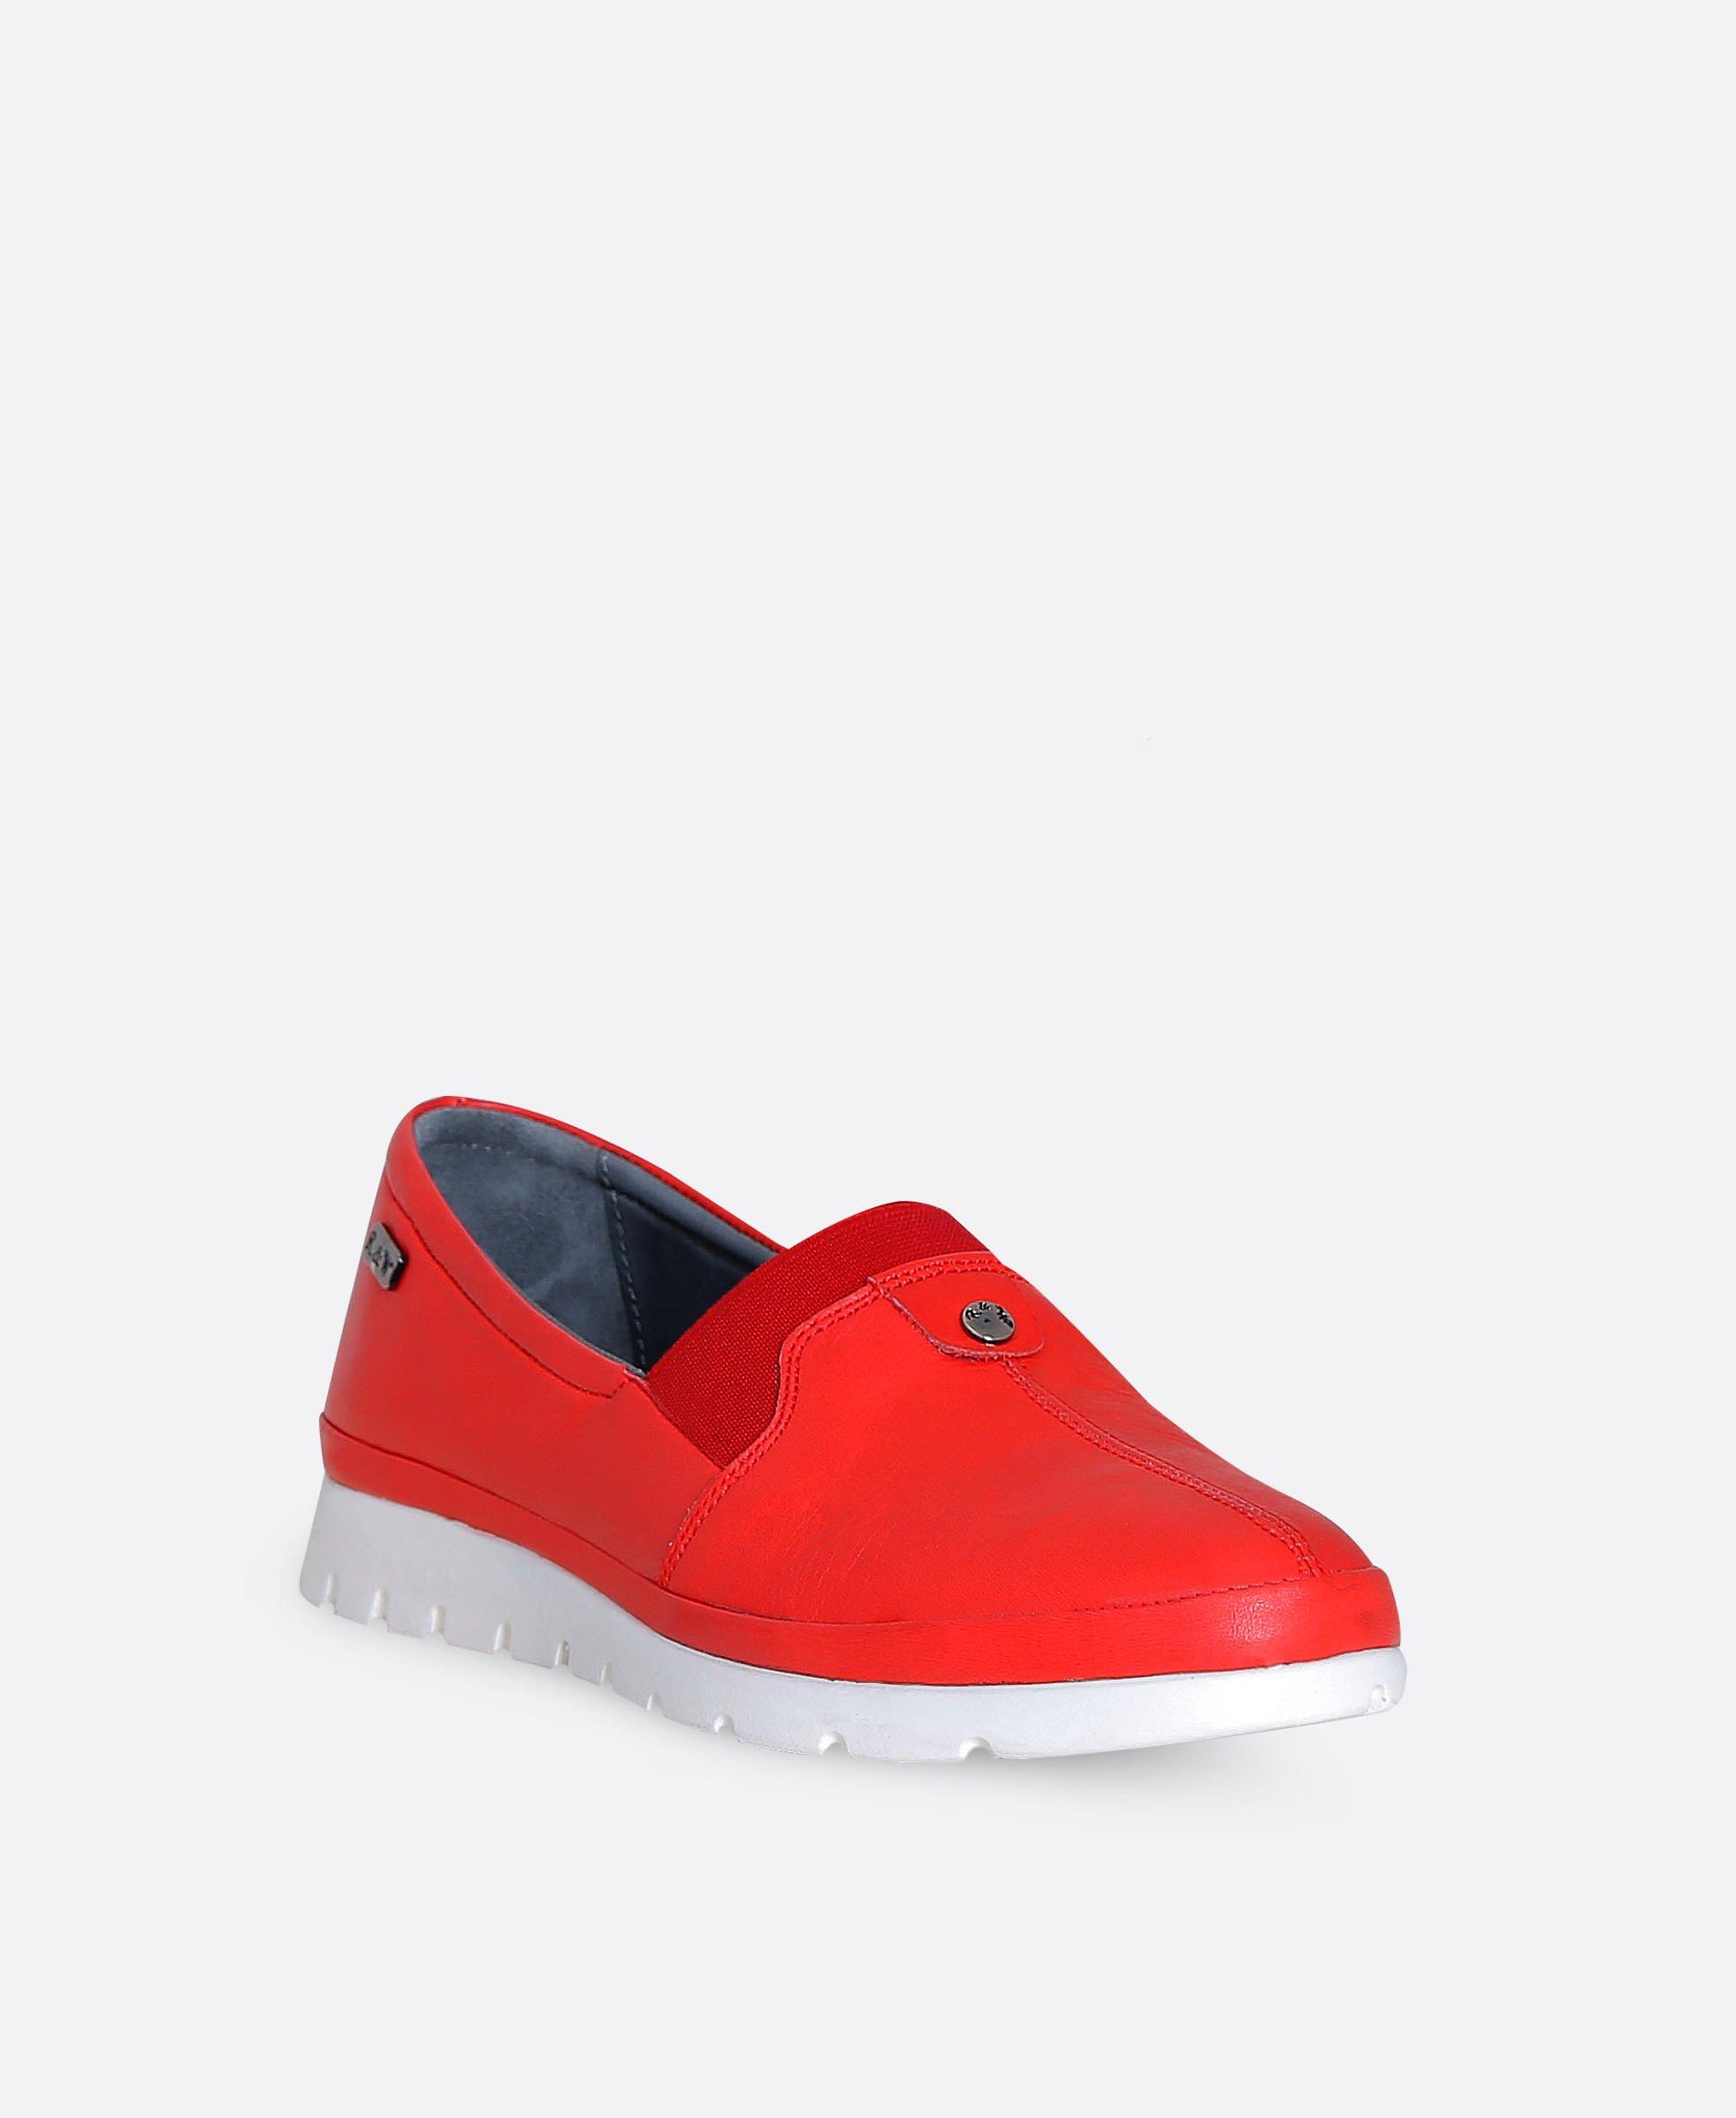 کفش زنانه چرم 0106